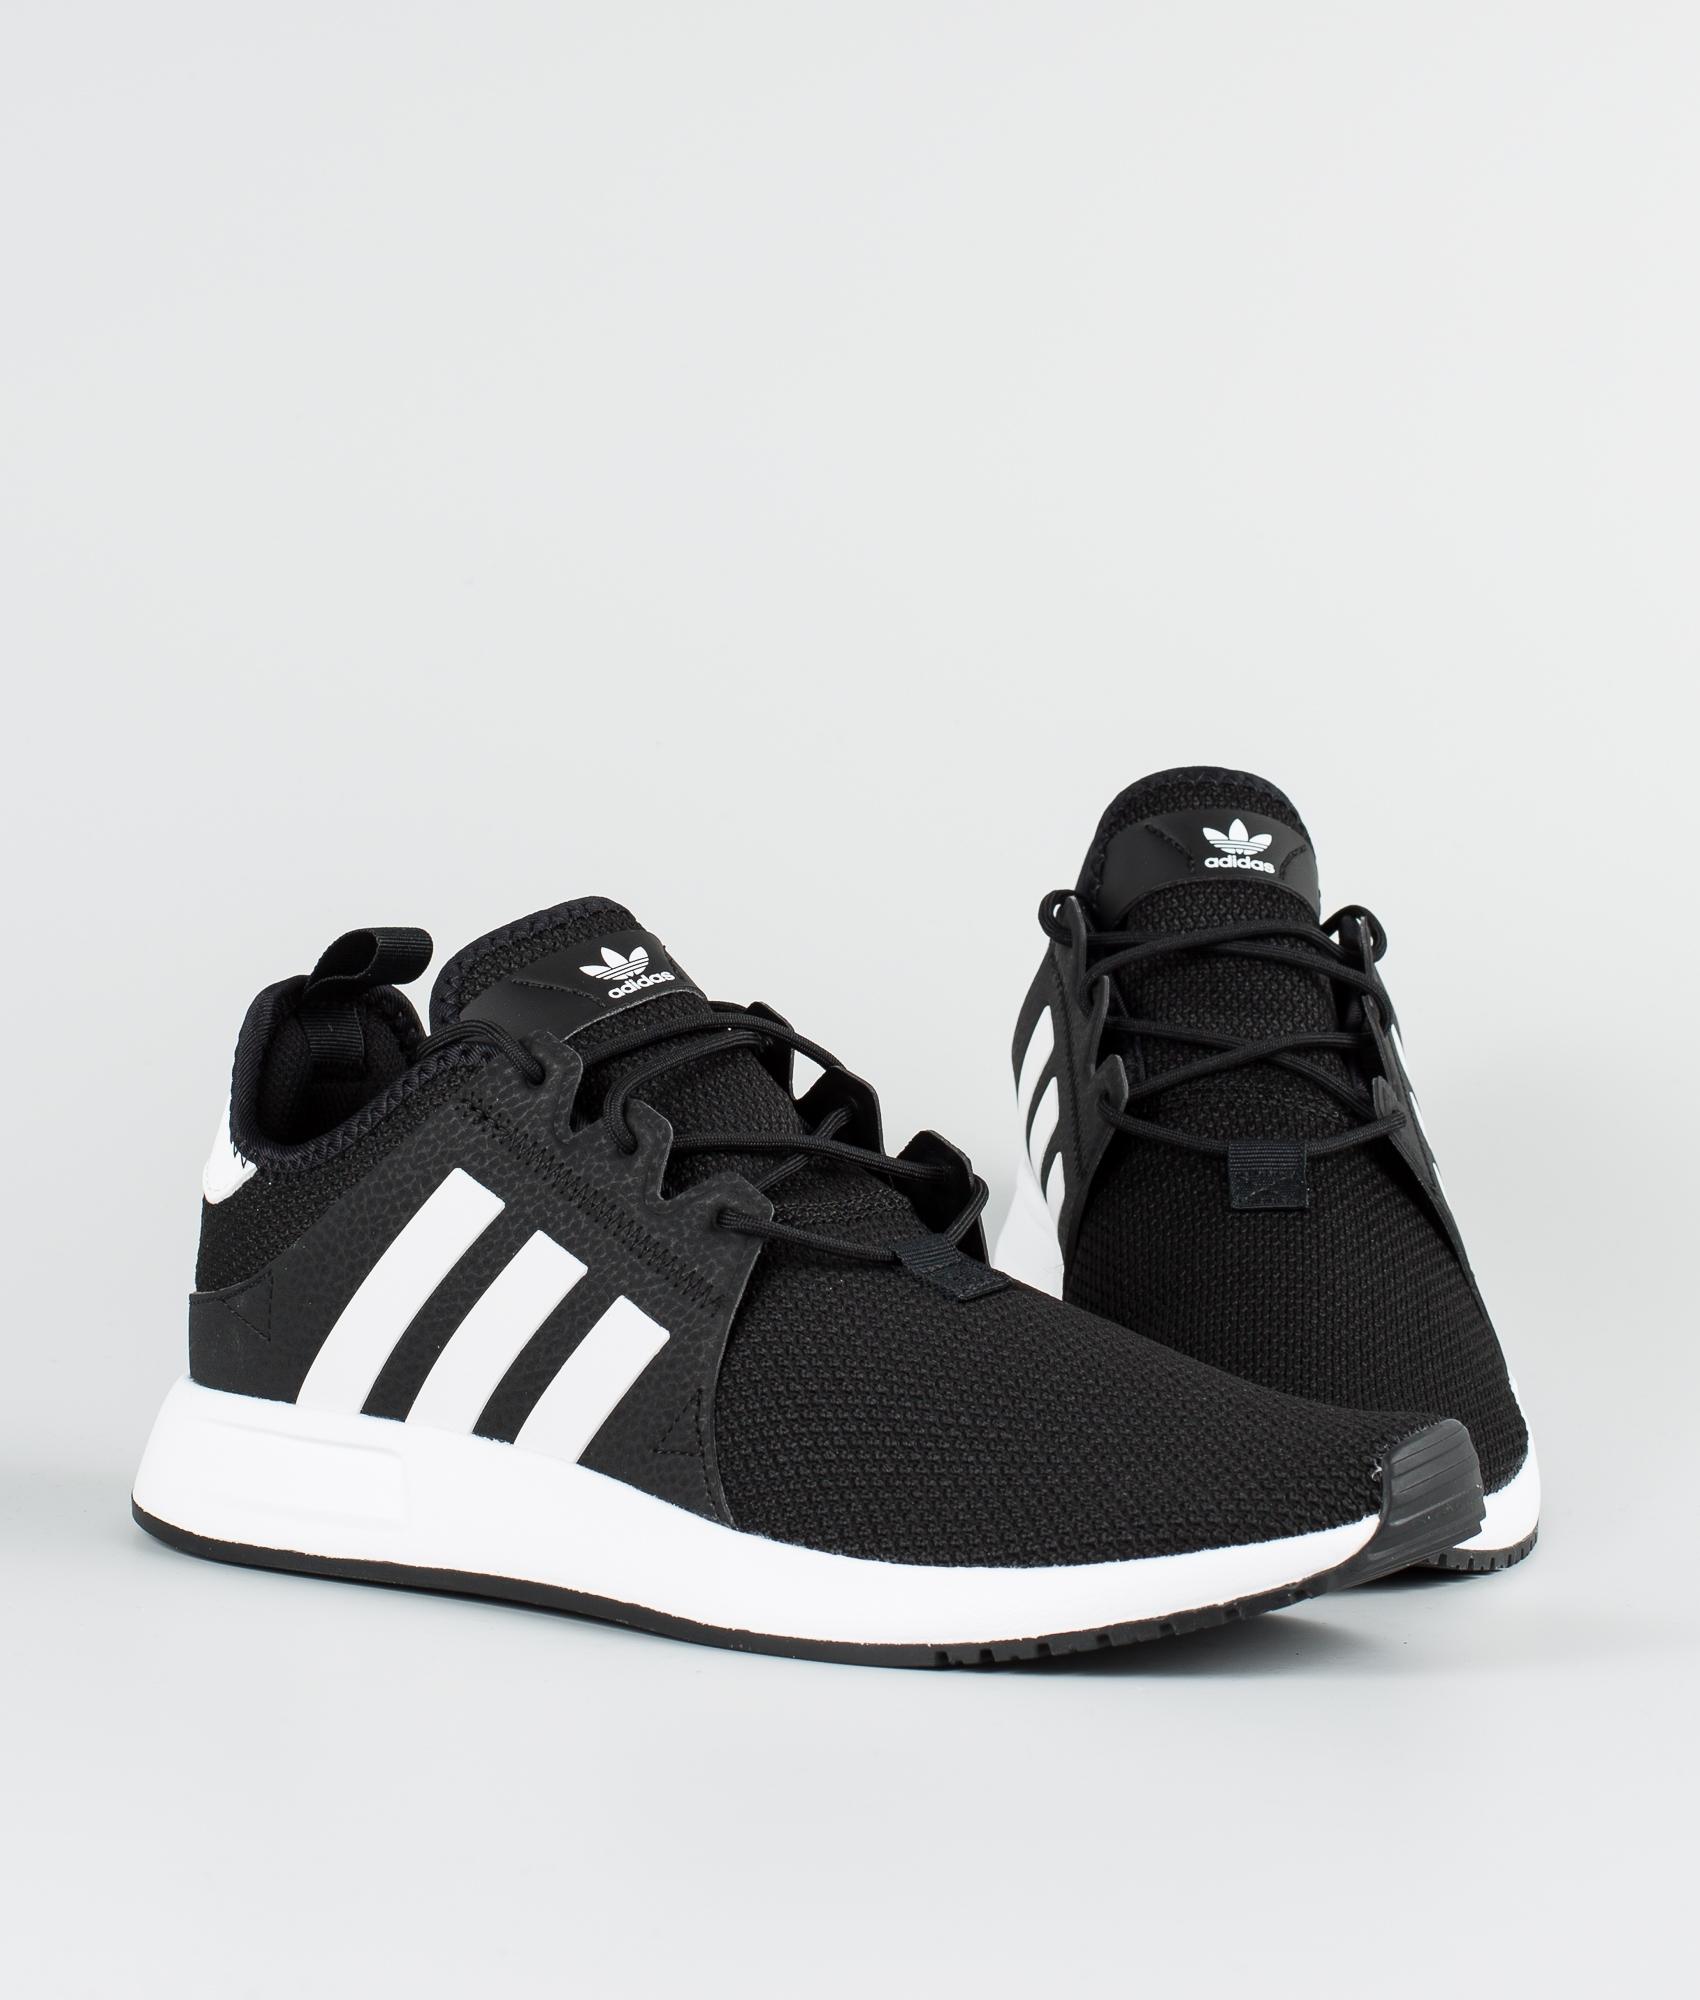 adidas Originals Skor X PLR Core BlackFtwr WhiteCore Black